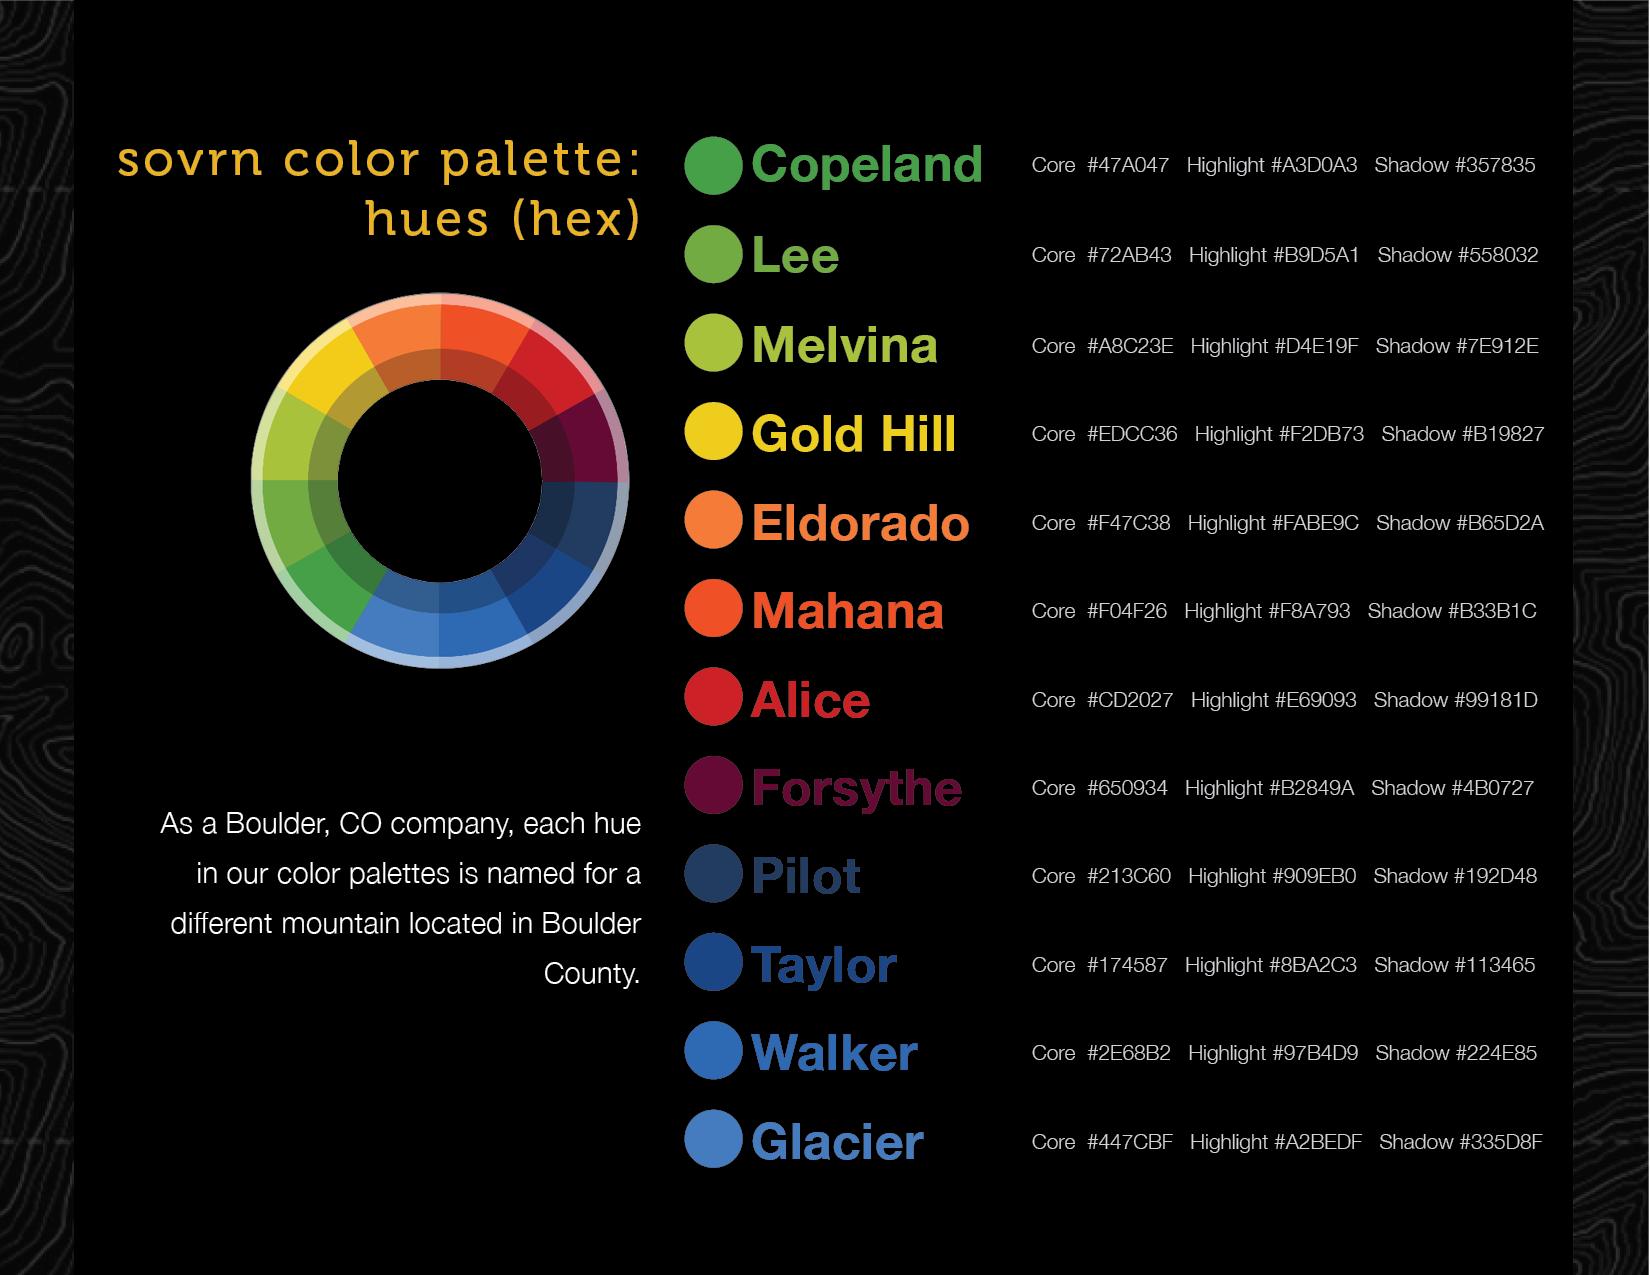 meridian_color_palette18.png